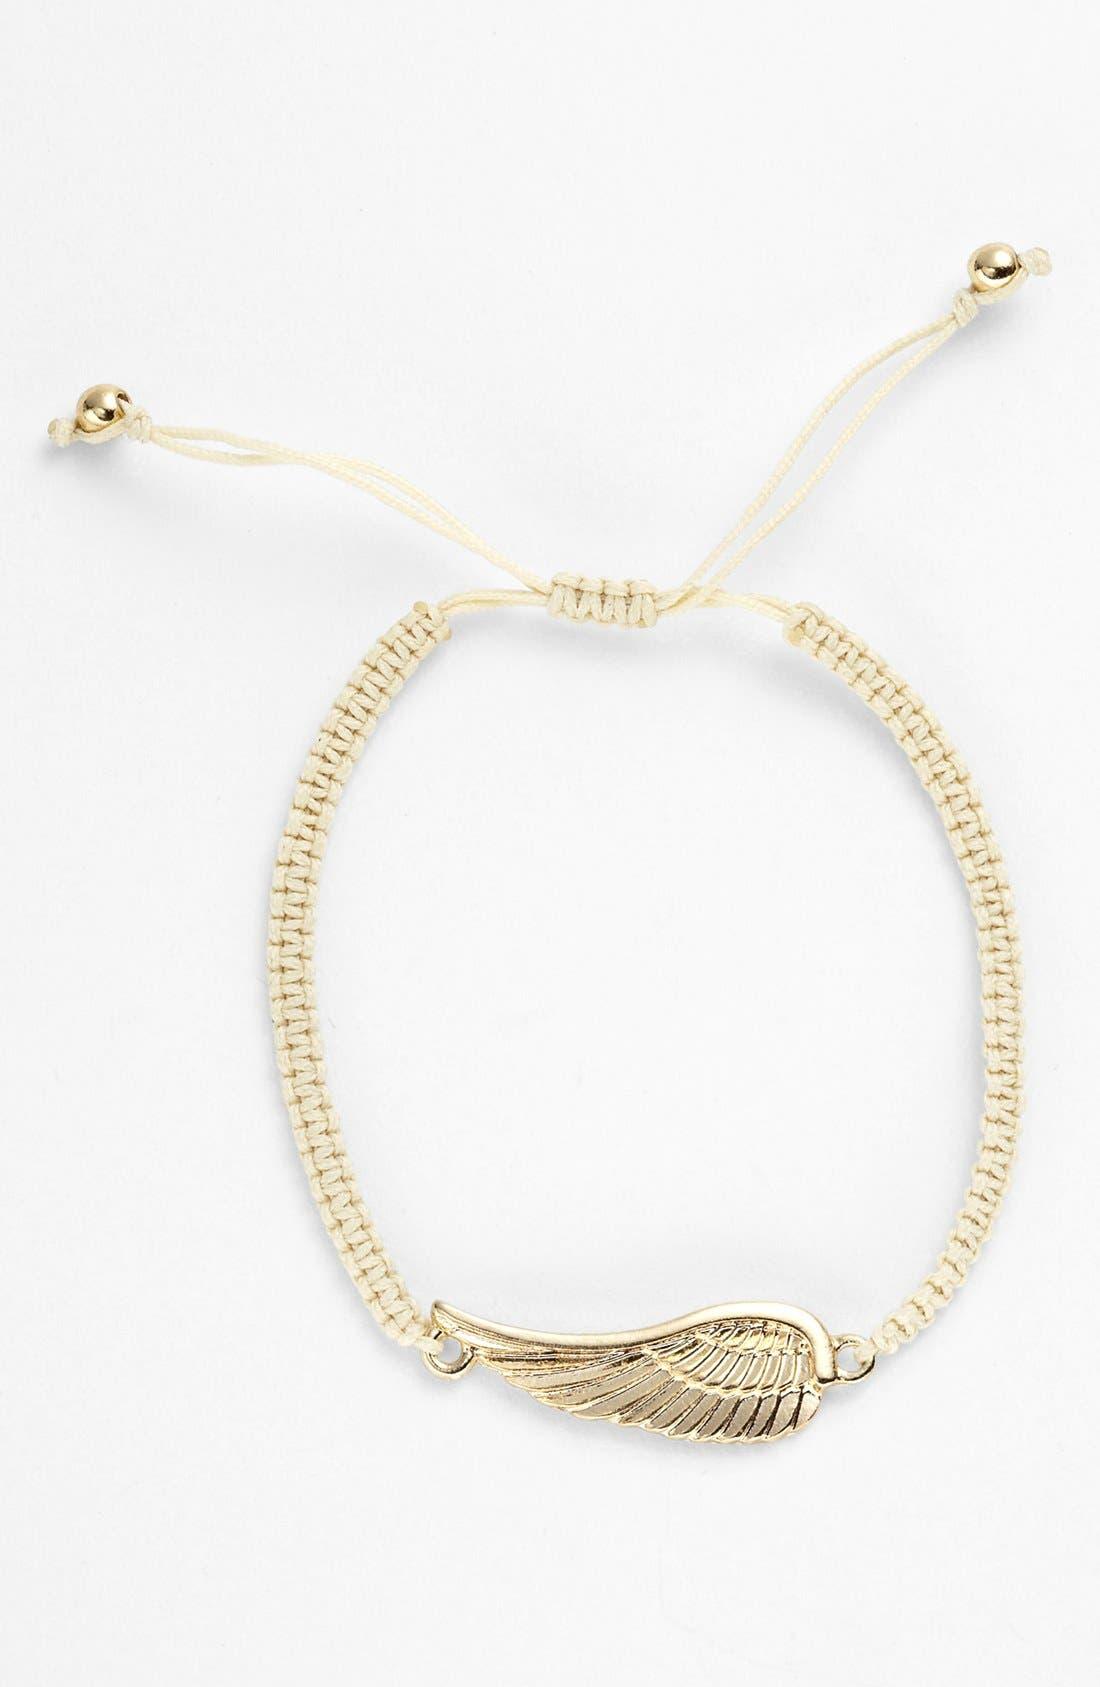 Alternate Image 1 Selected - NICO NEW YORK 'Angel Wing' Rope Bracelet